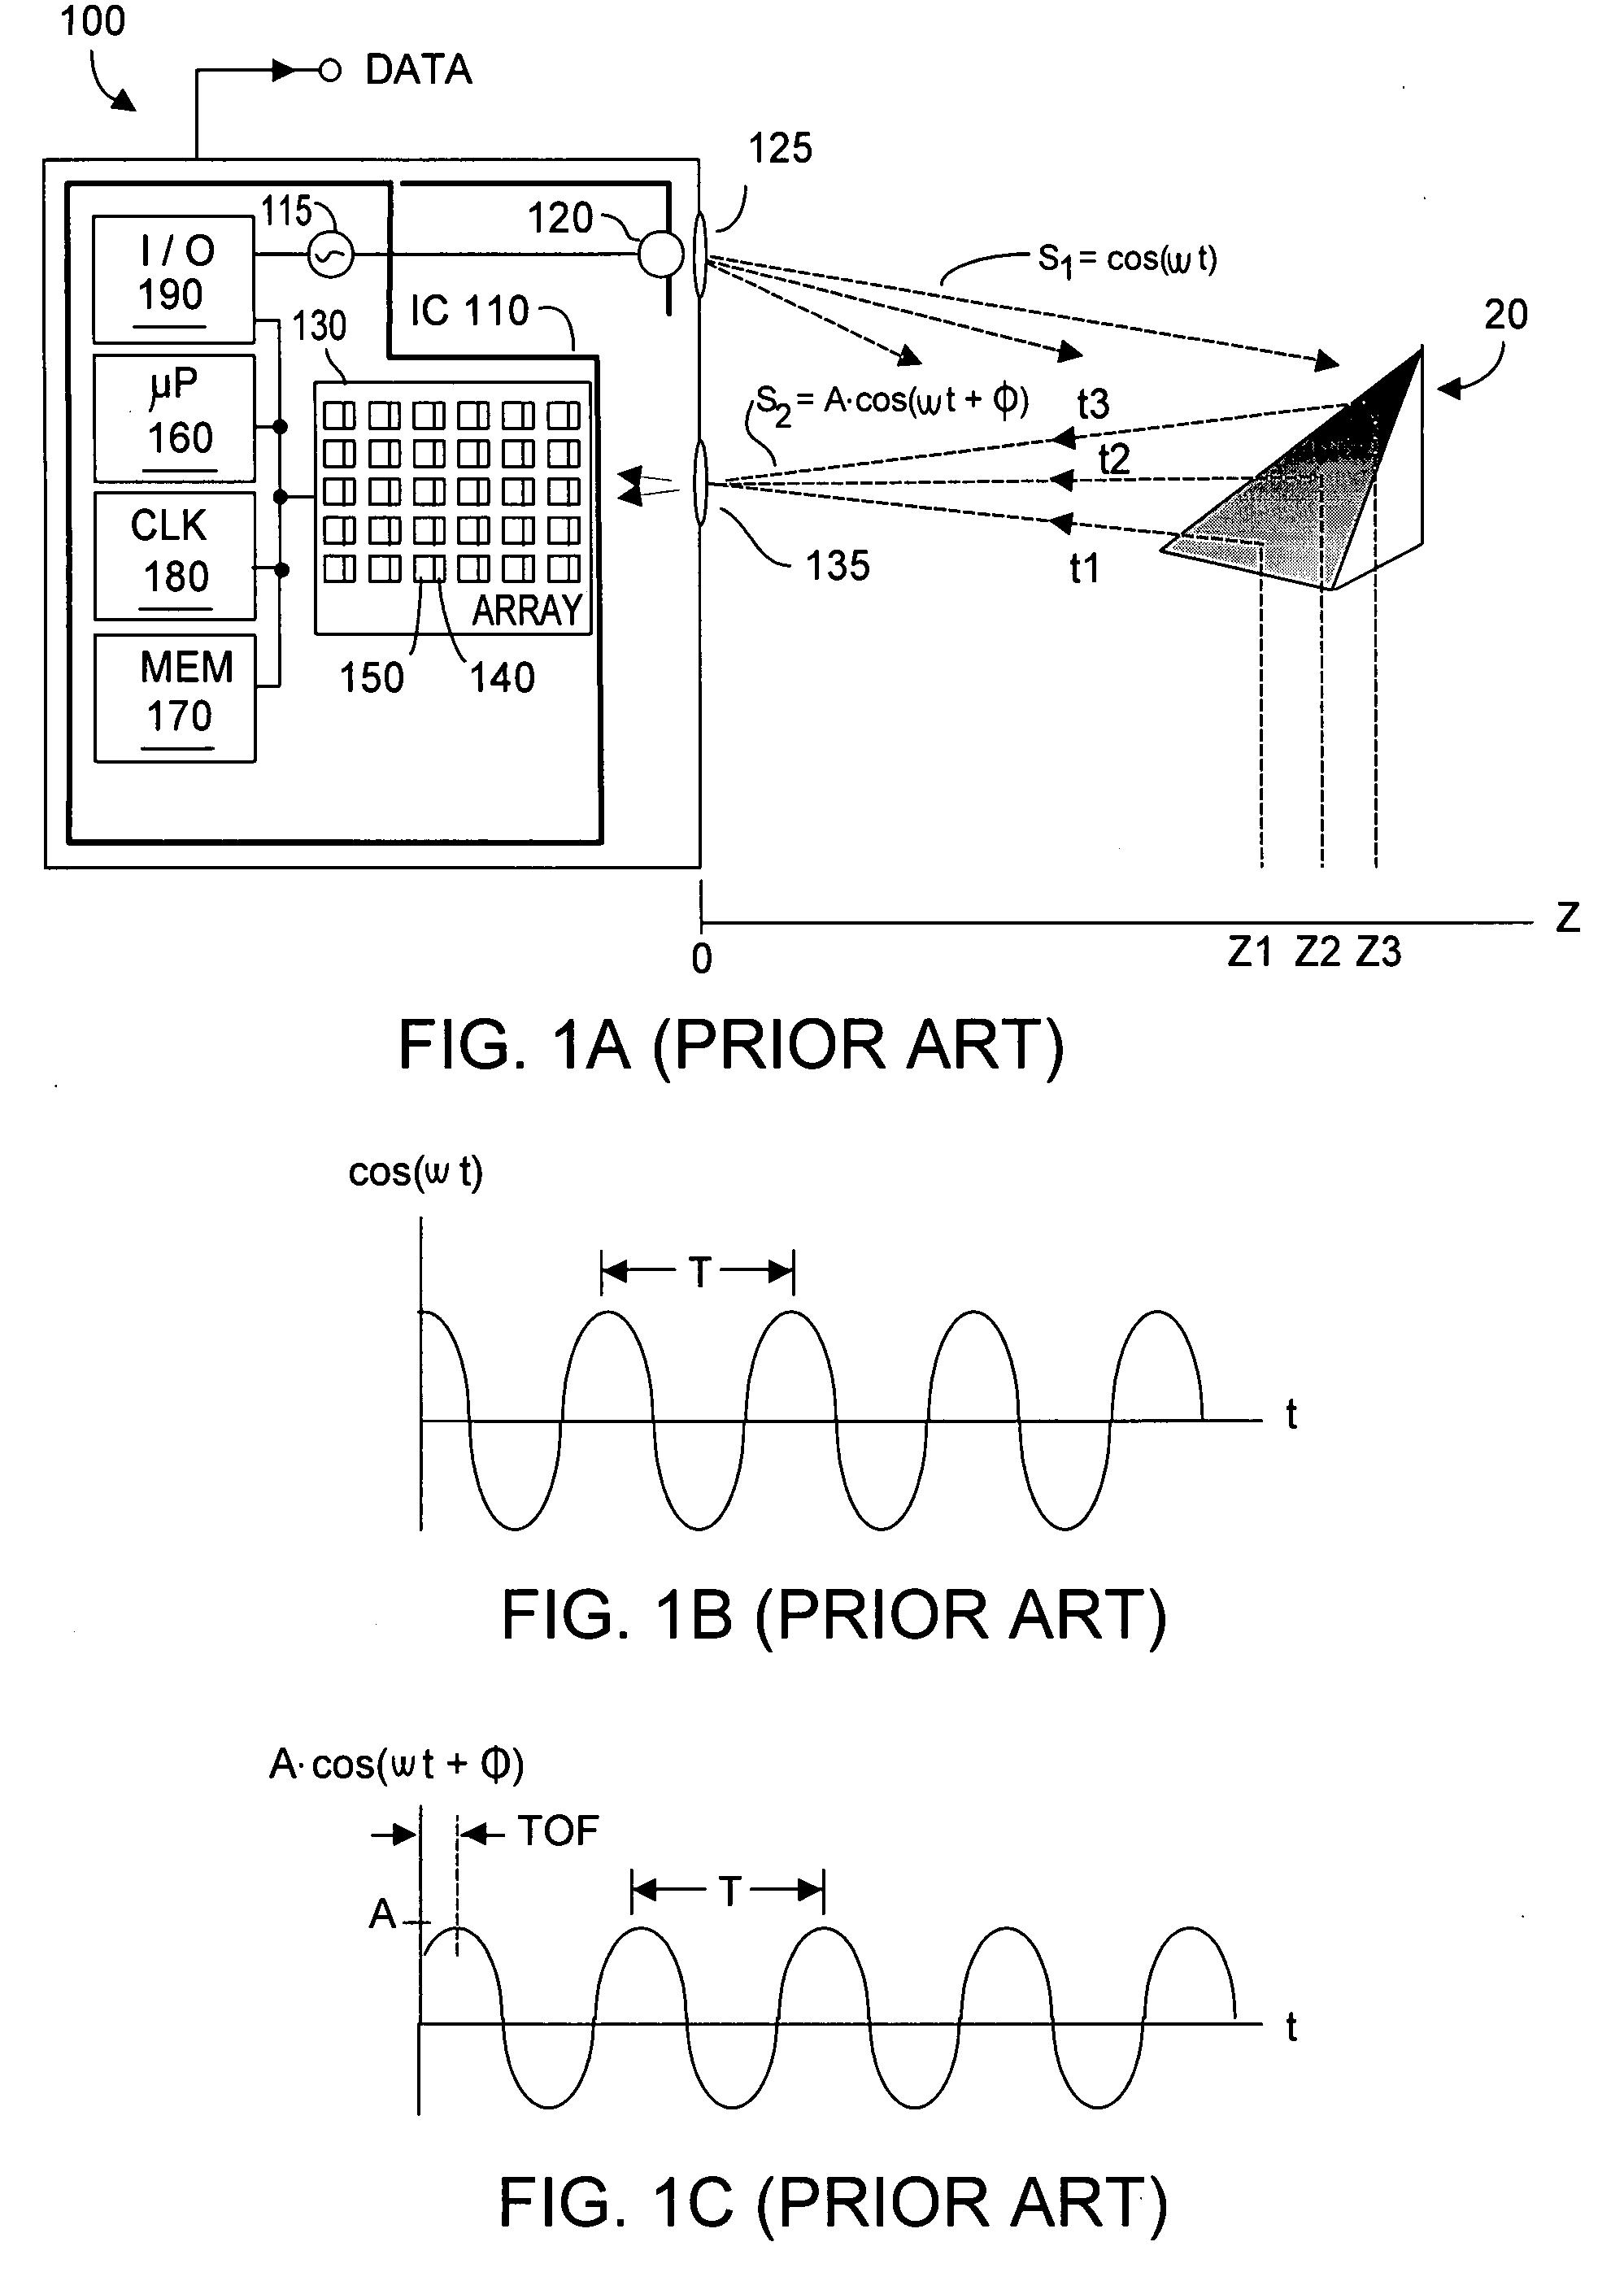 Servo Sweep Driver Circuit Diagram Tradeoficcom Widerange Function Generator Phaseshift Oscillator Wiring Patent Us7405812 Method And System To Avoid Inter